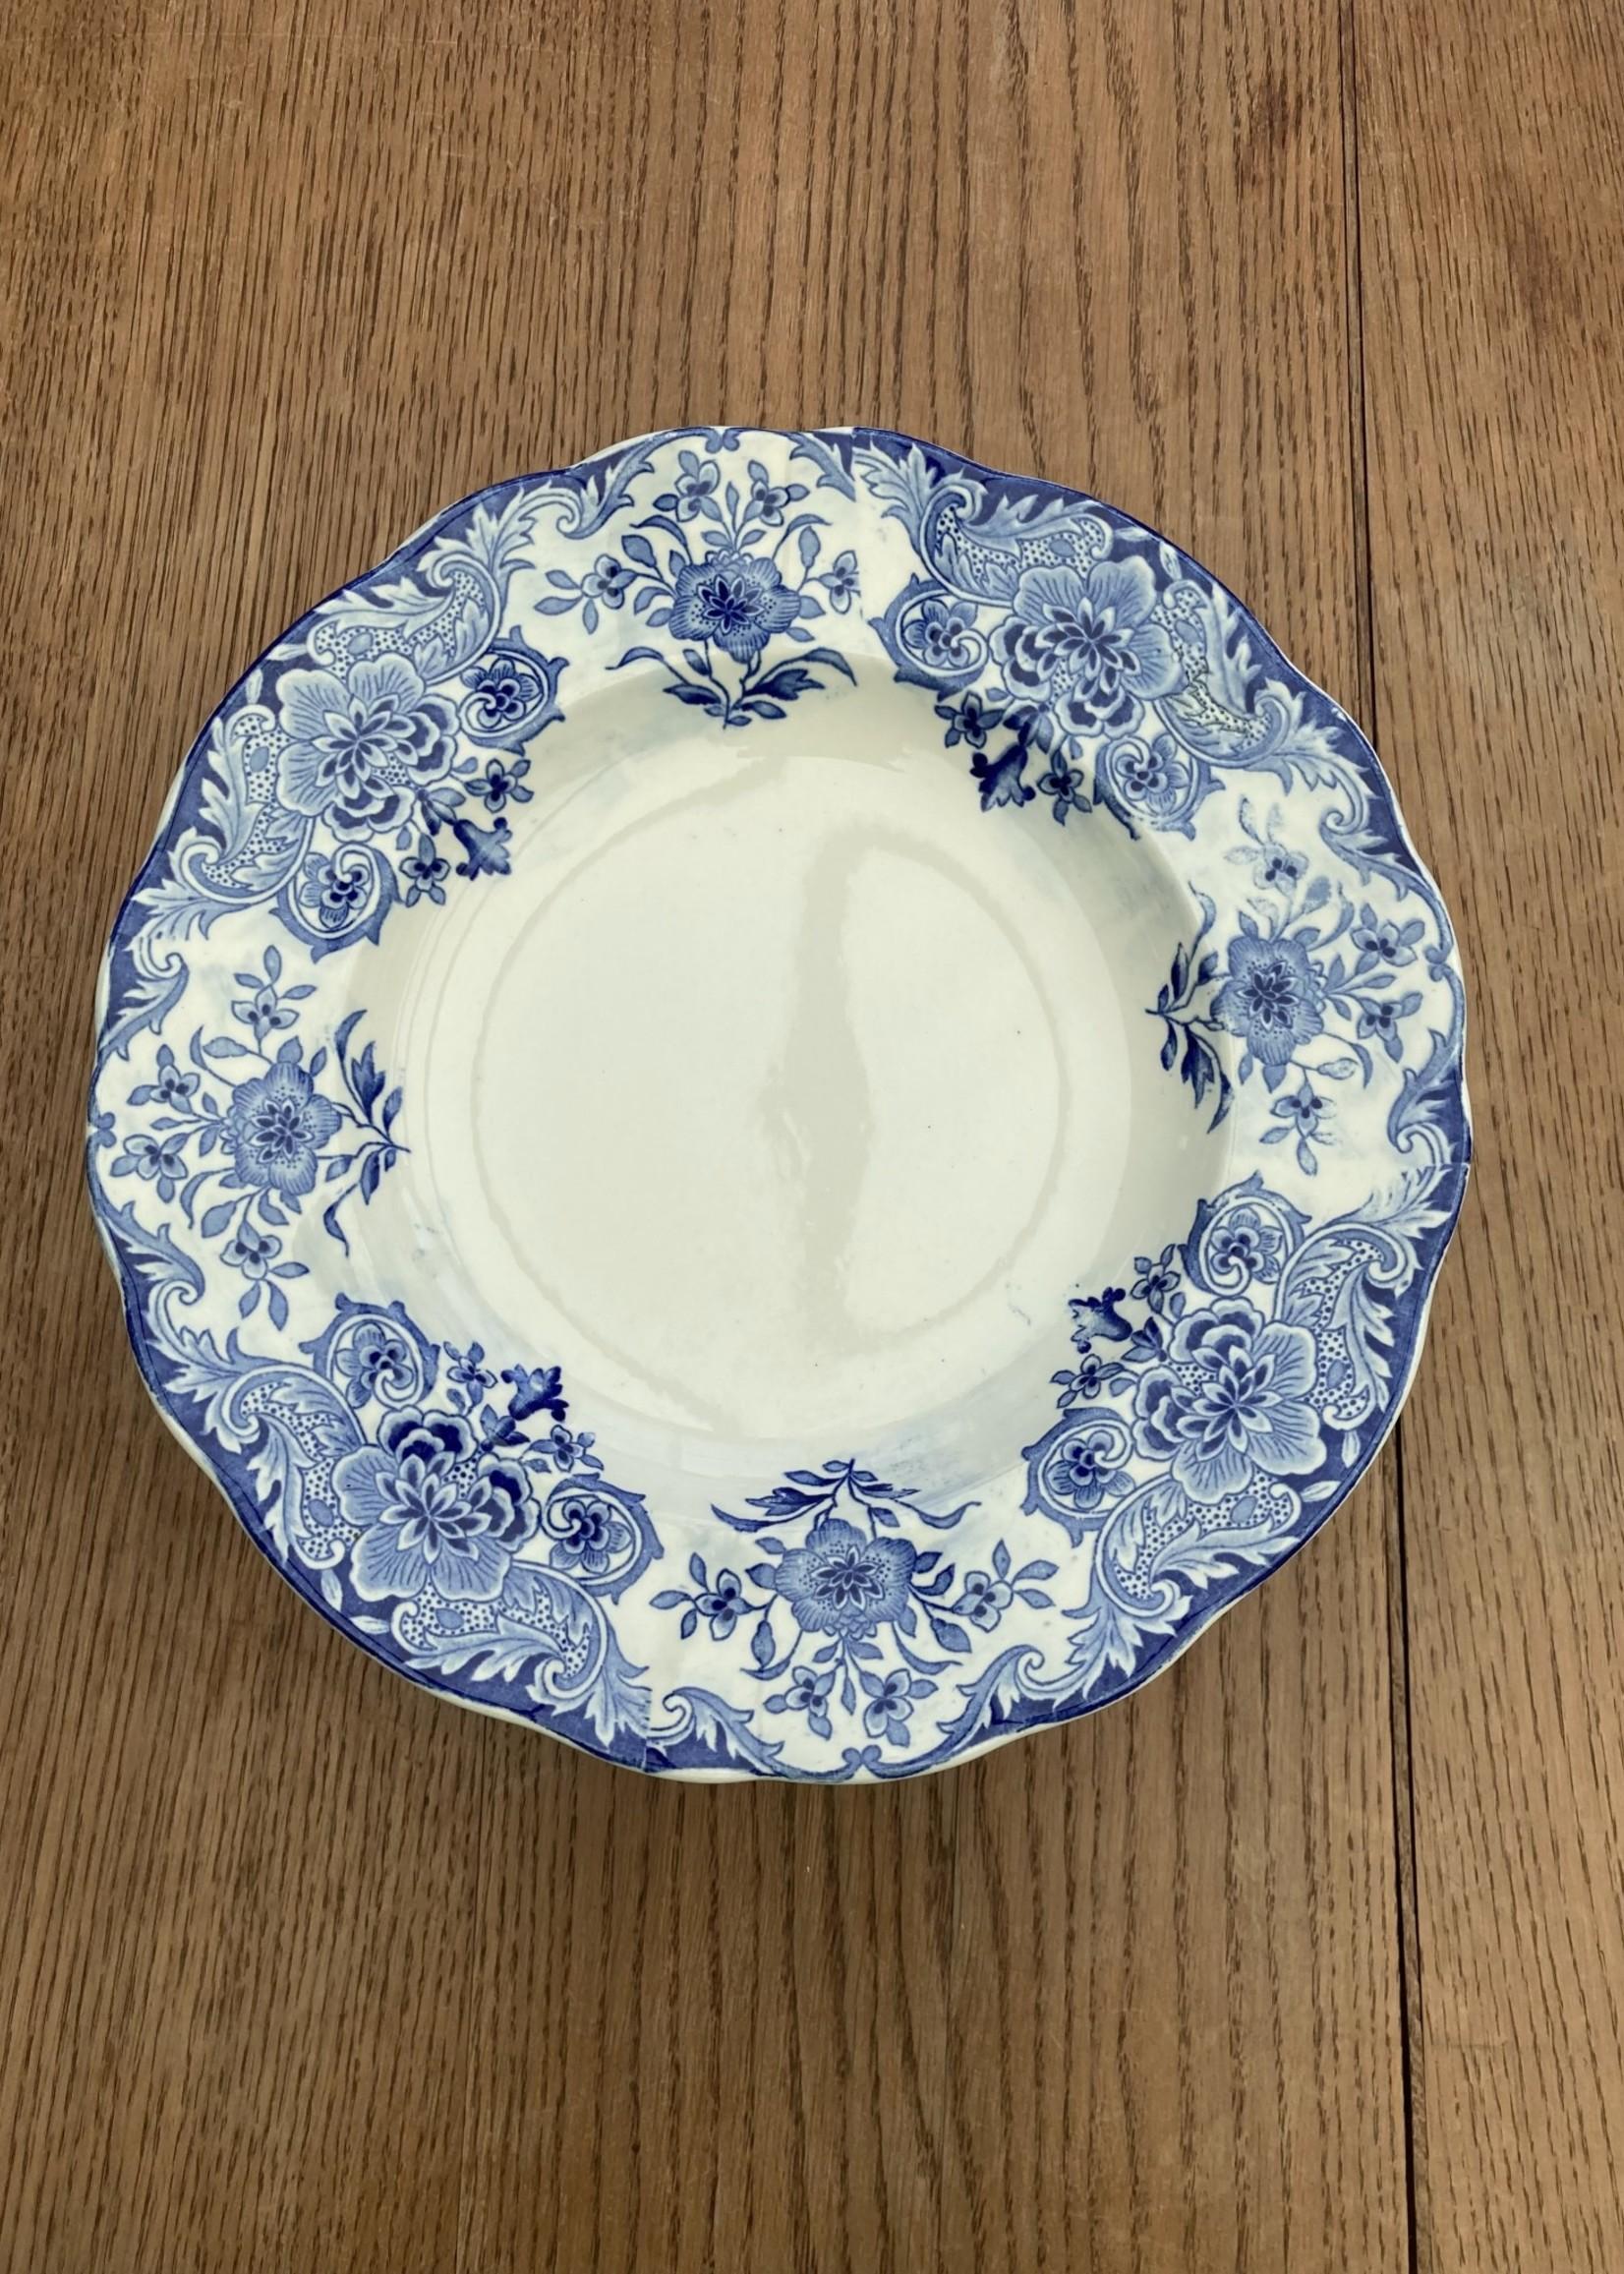 Small plate Dordrecht by Boch